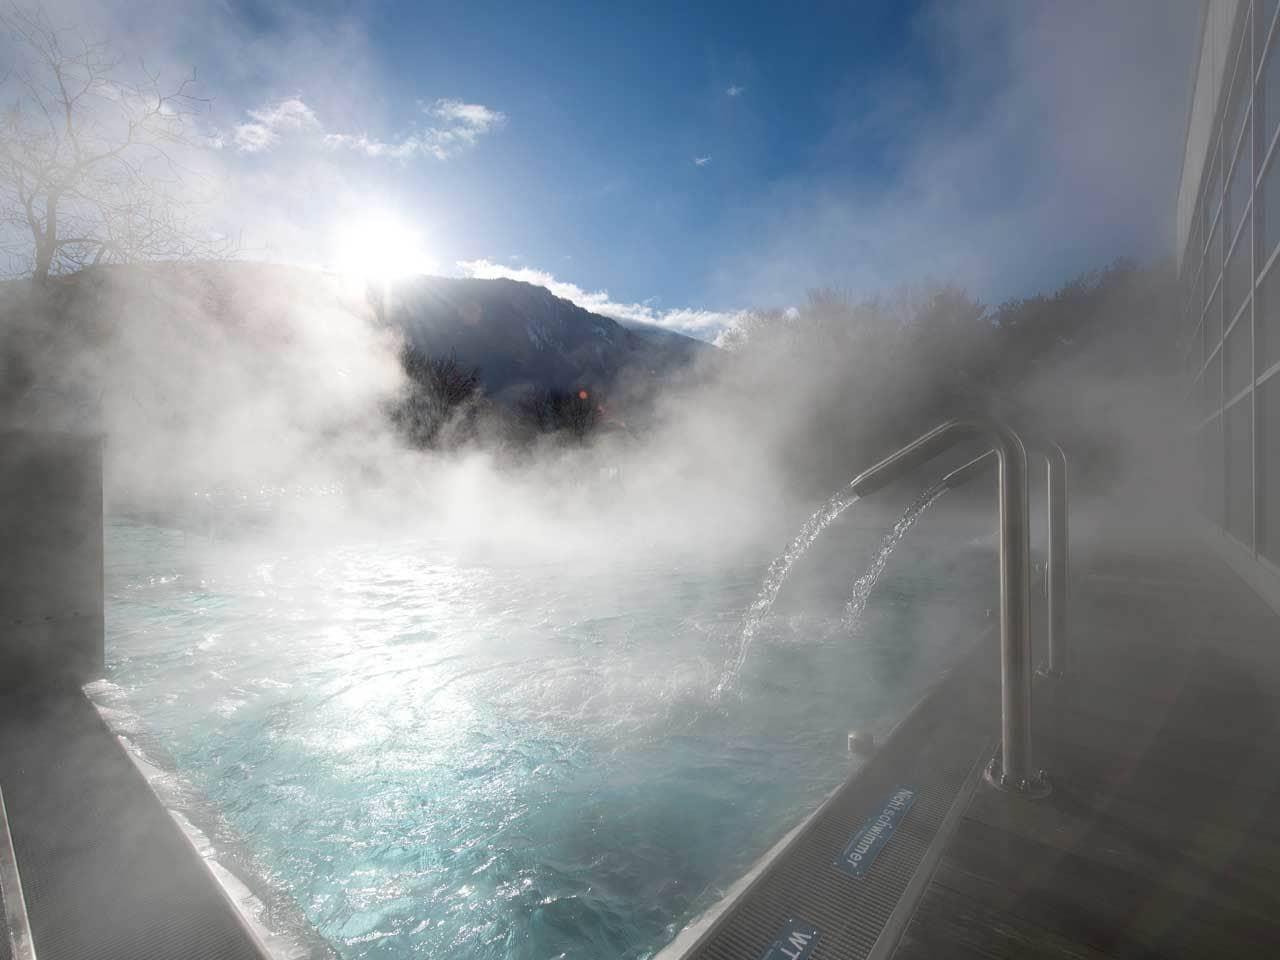 Aquamarin – Warmwasser-Erlebnisbad in Chur